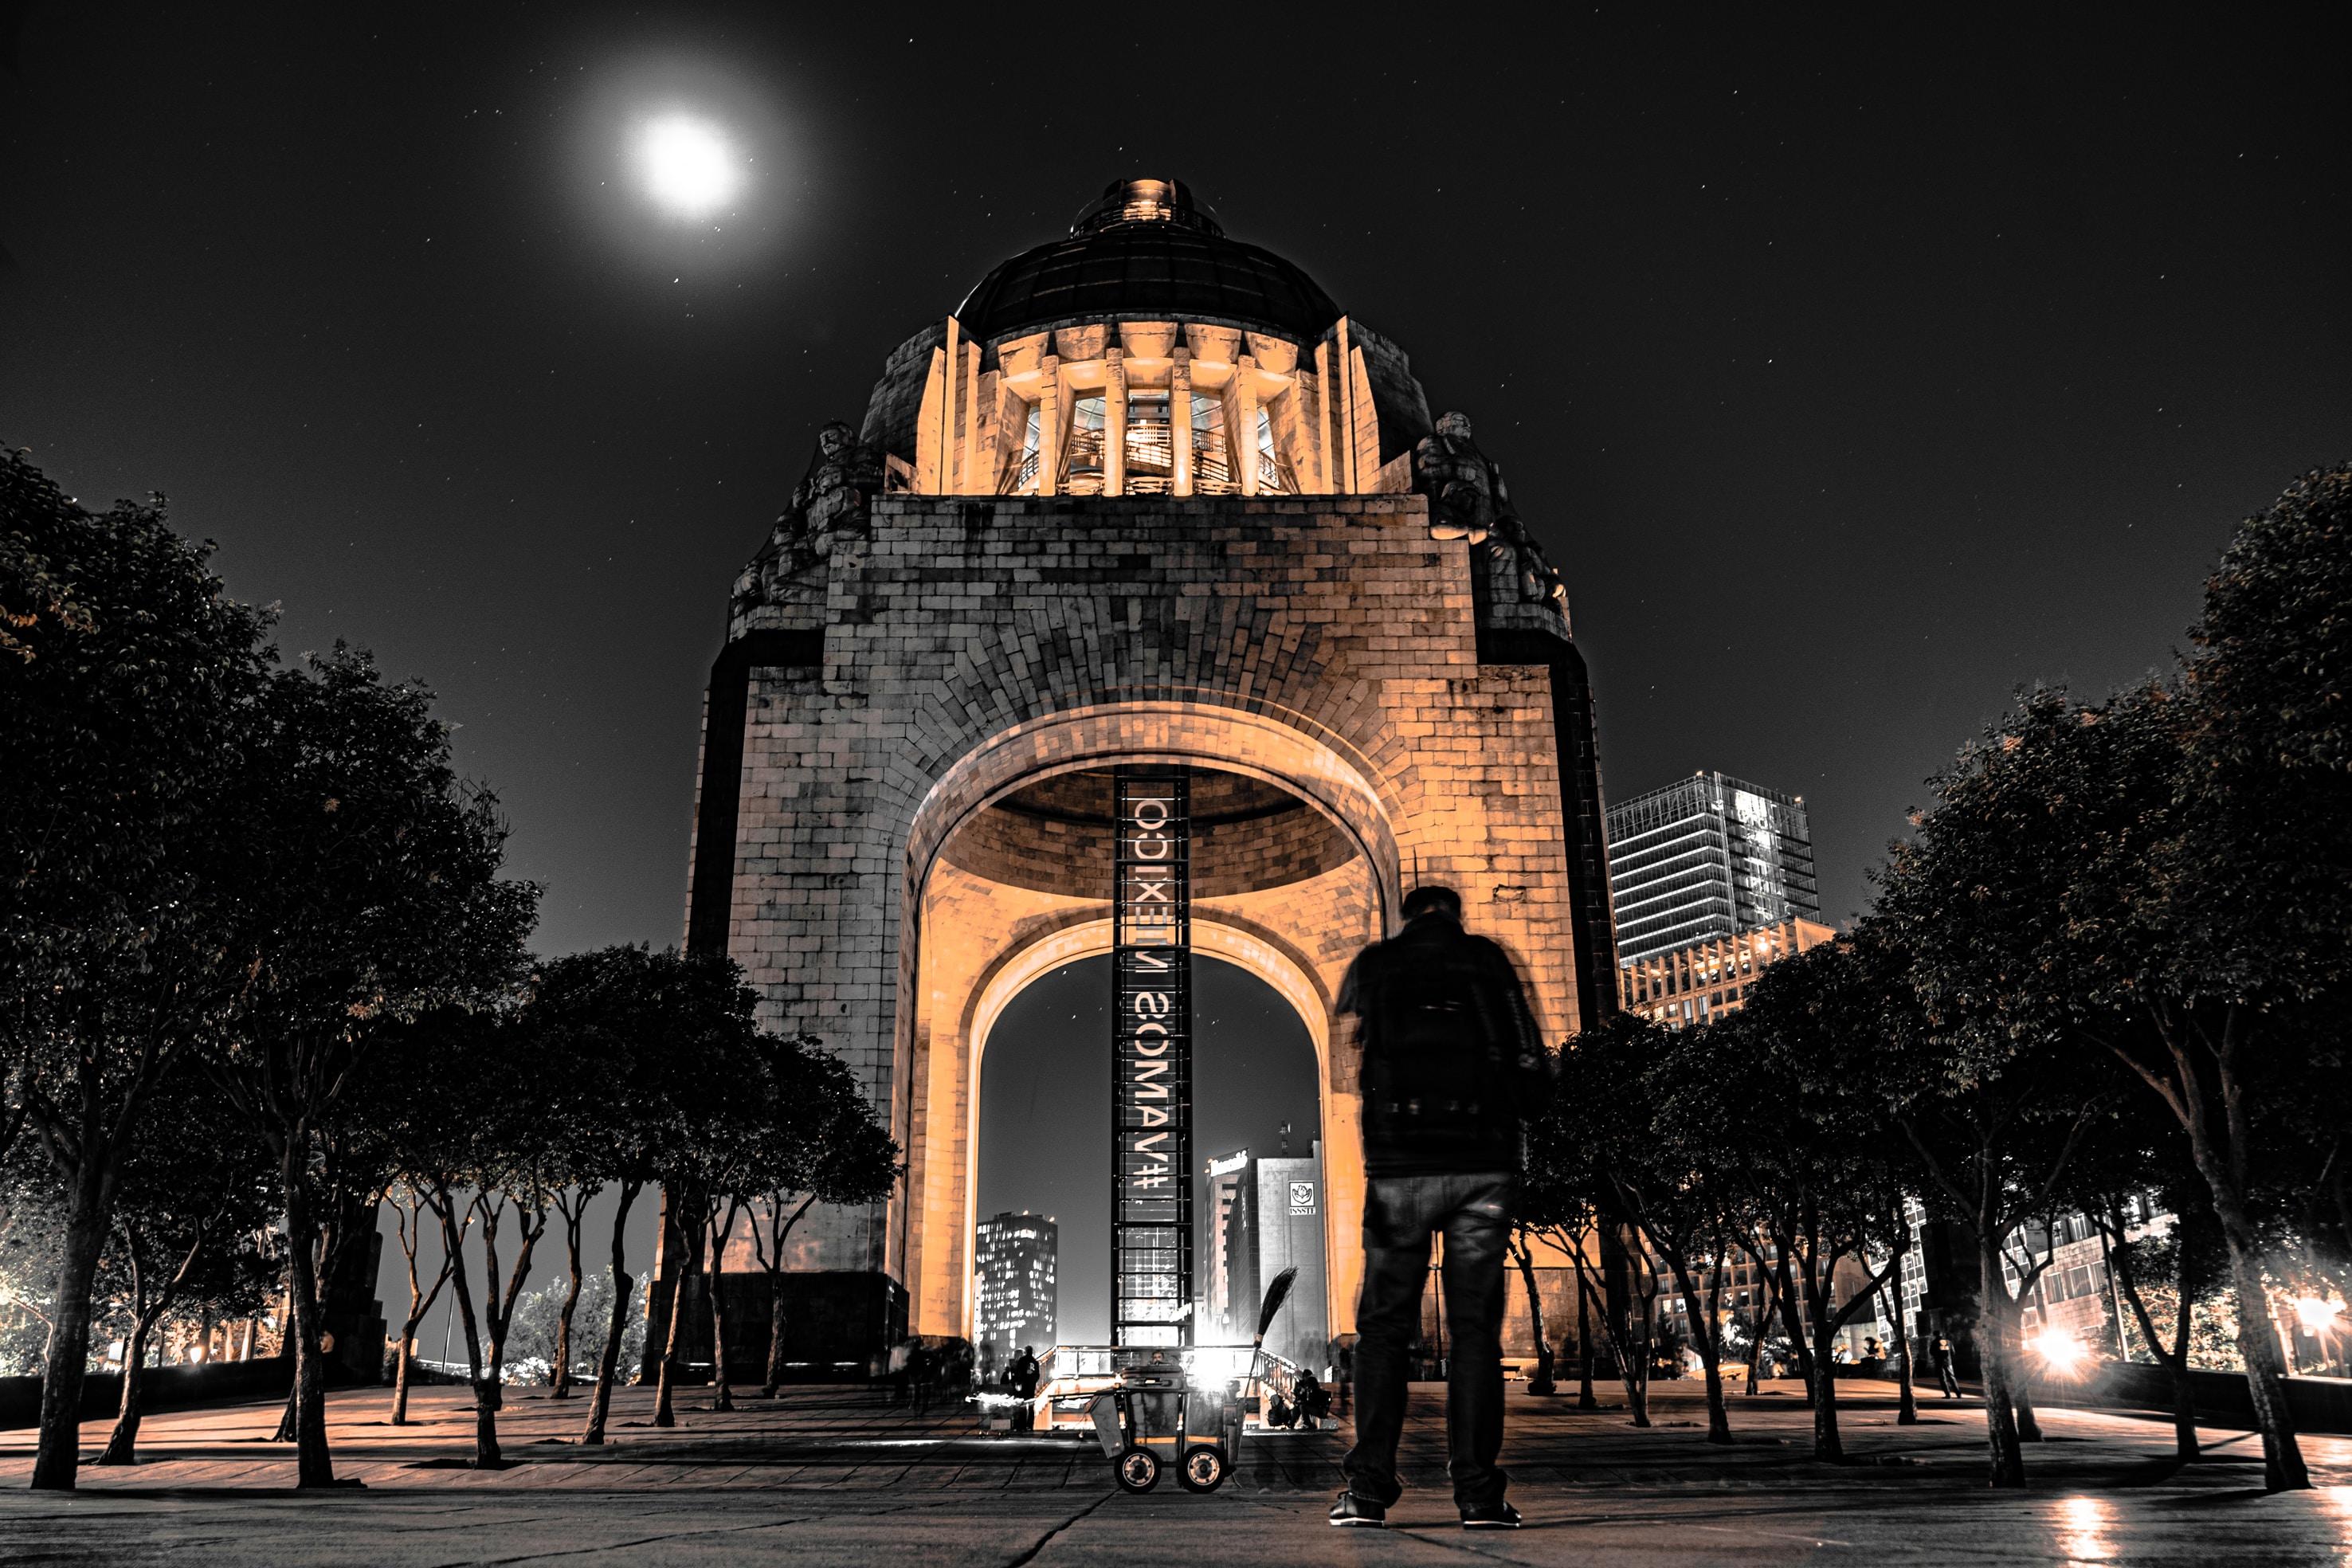 Image by Guillermo Pérez